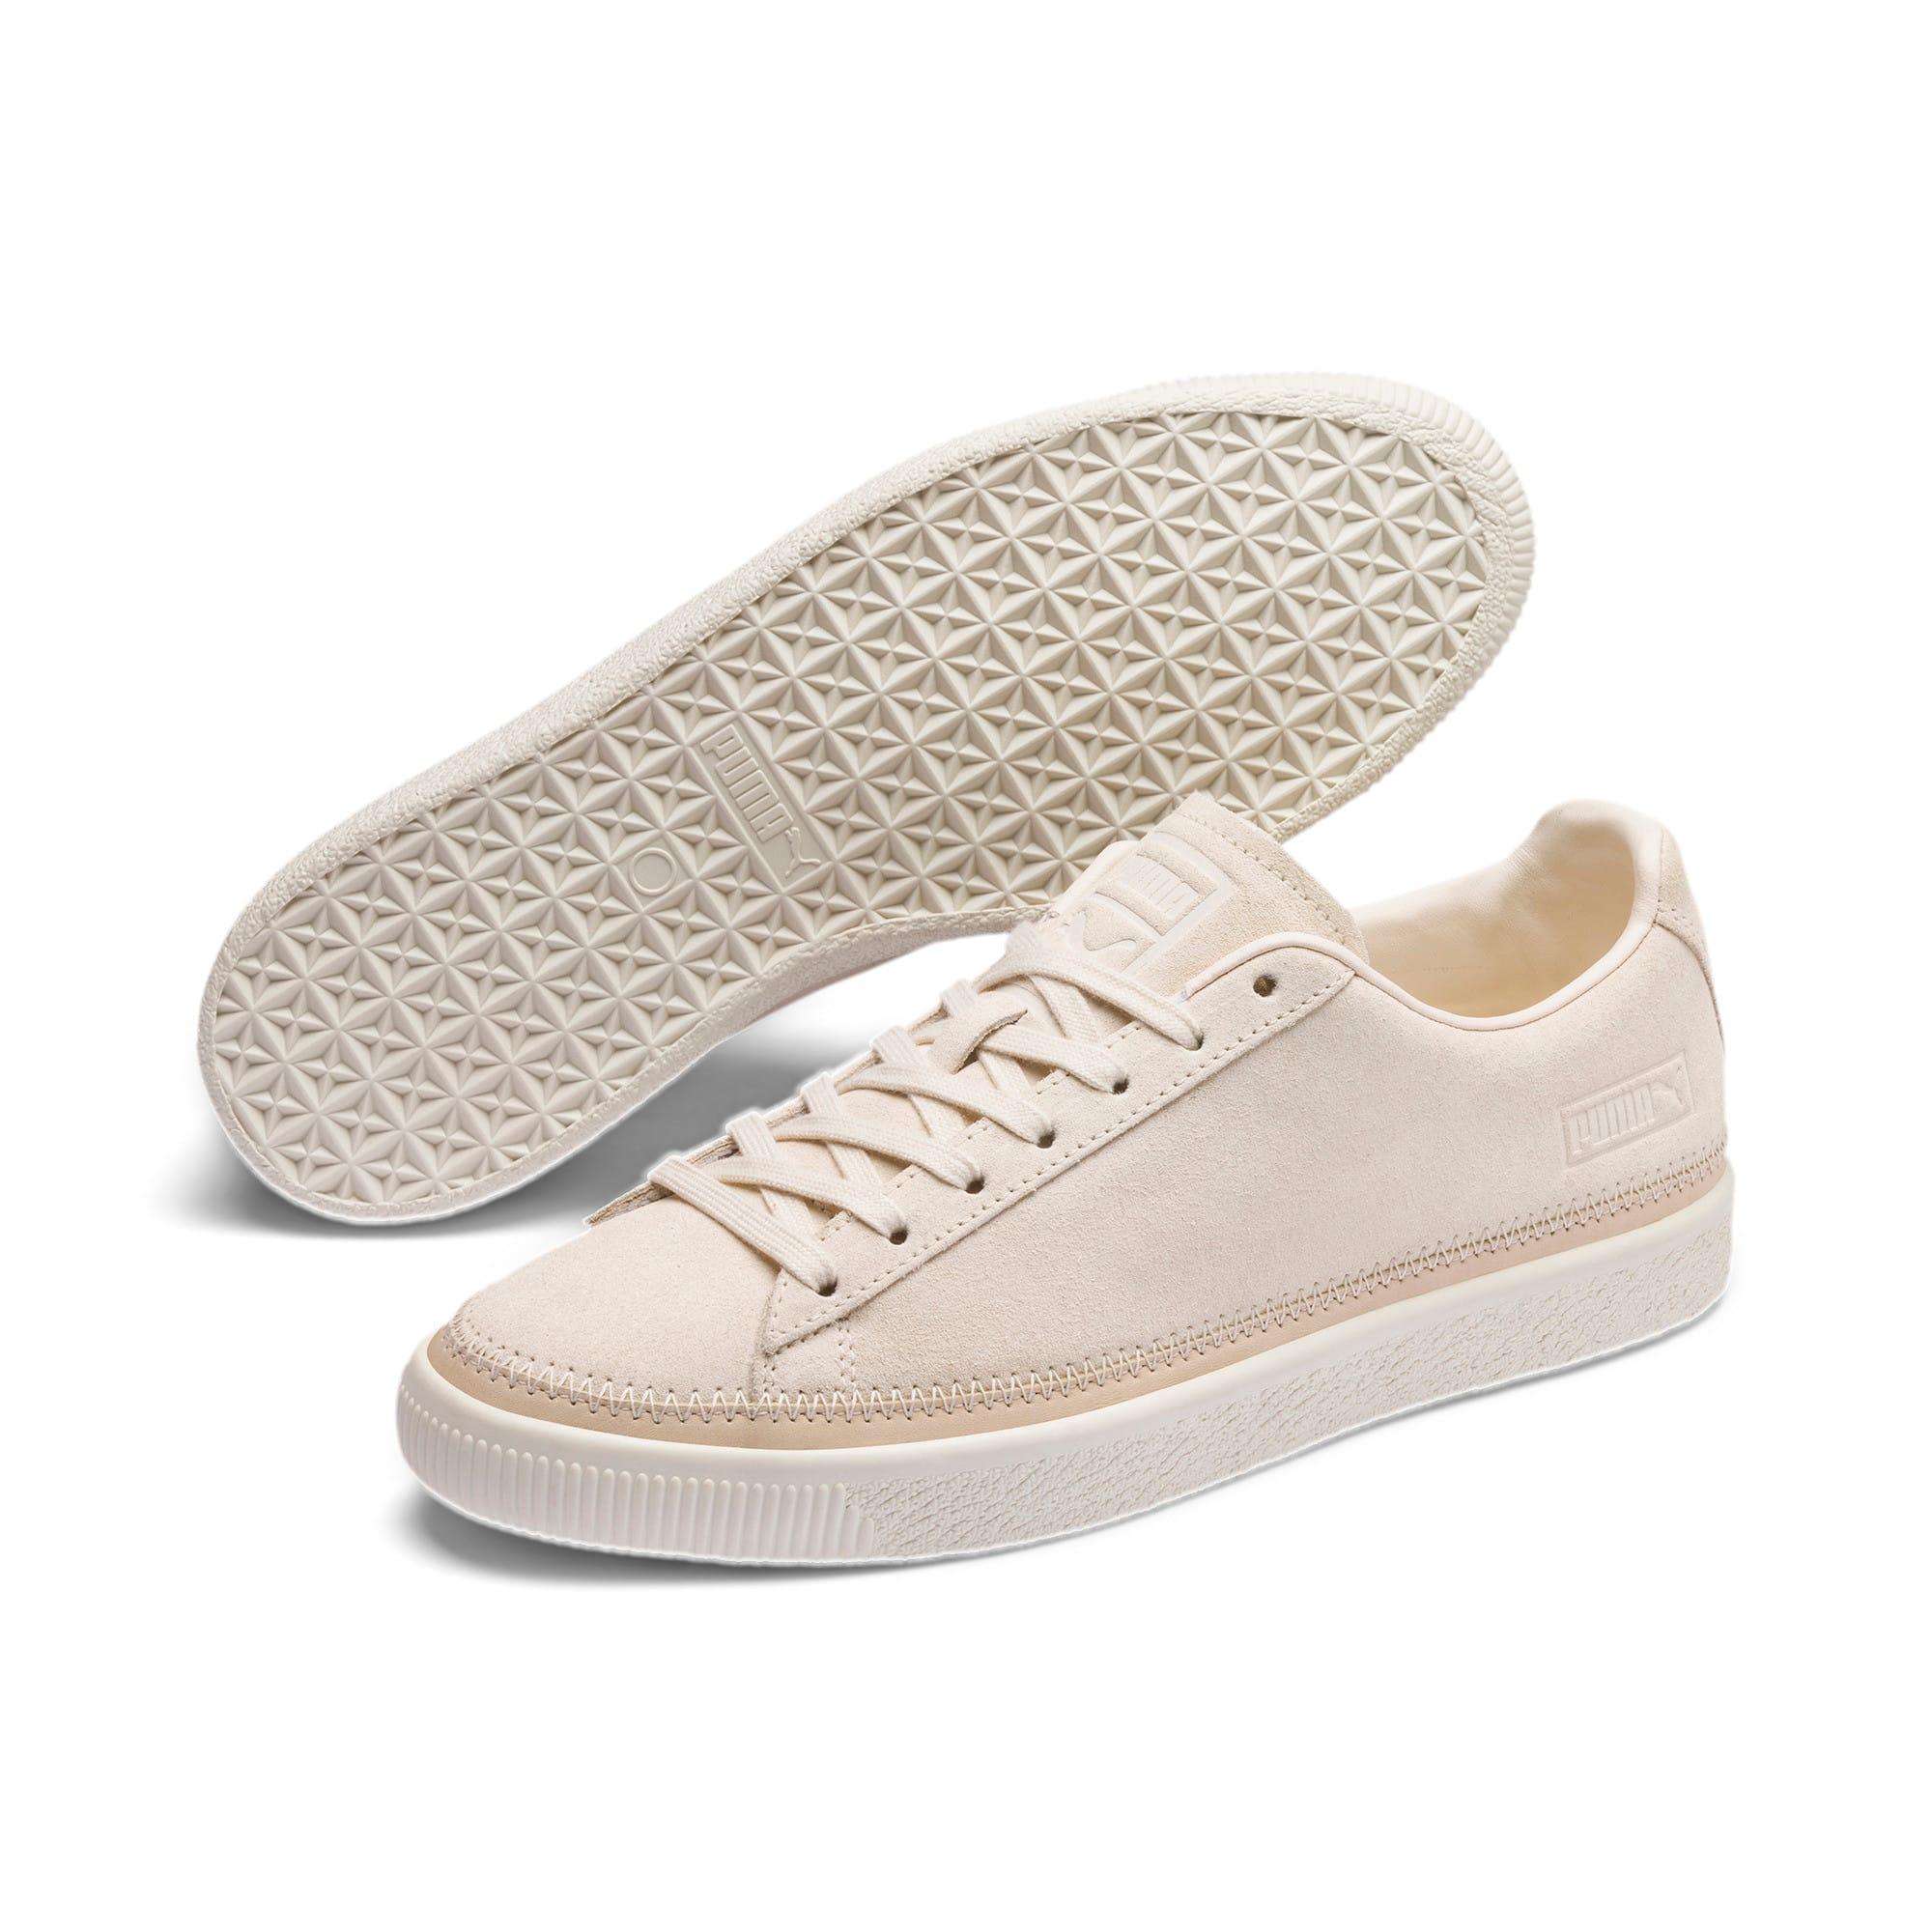 Miniatura 2 de Zapatos deportivos Suede Trim PRM, White Smoke-Whisper White, mediano